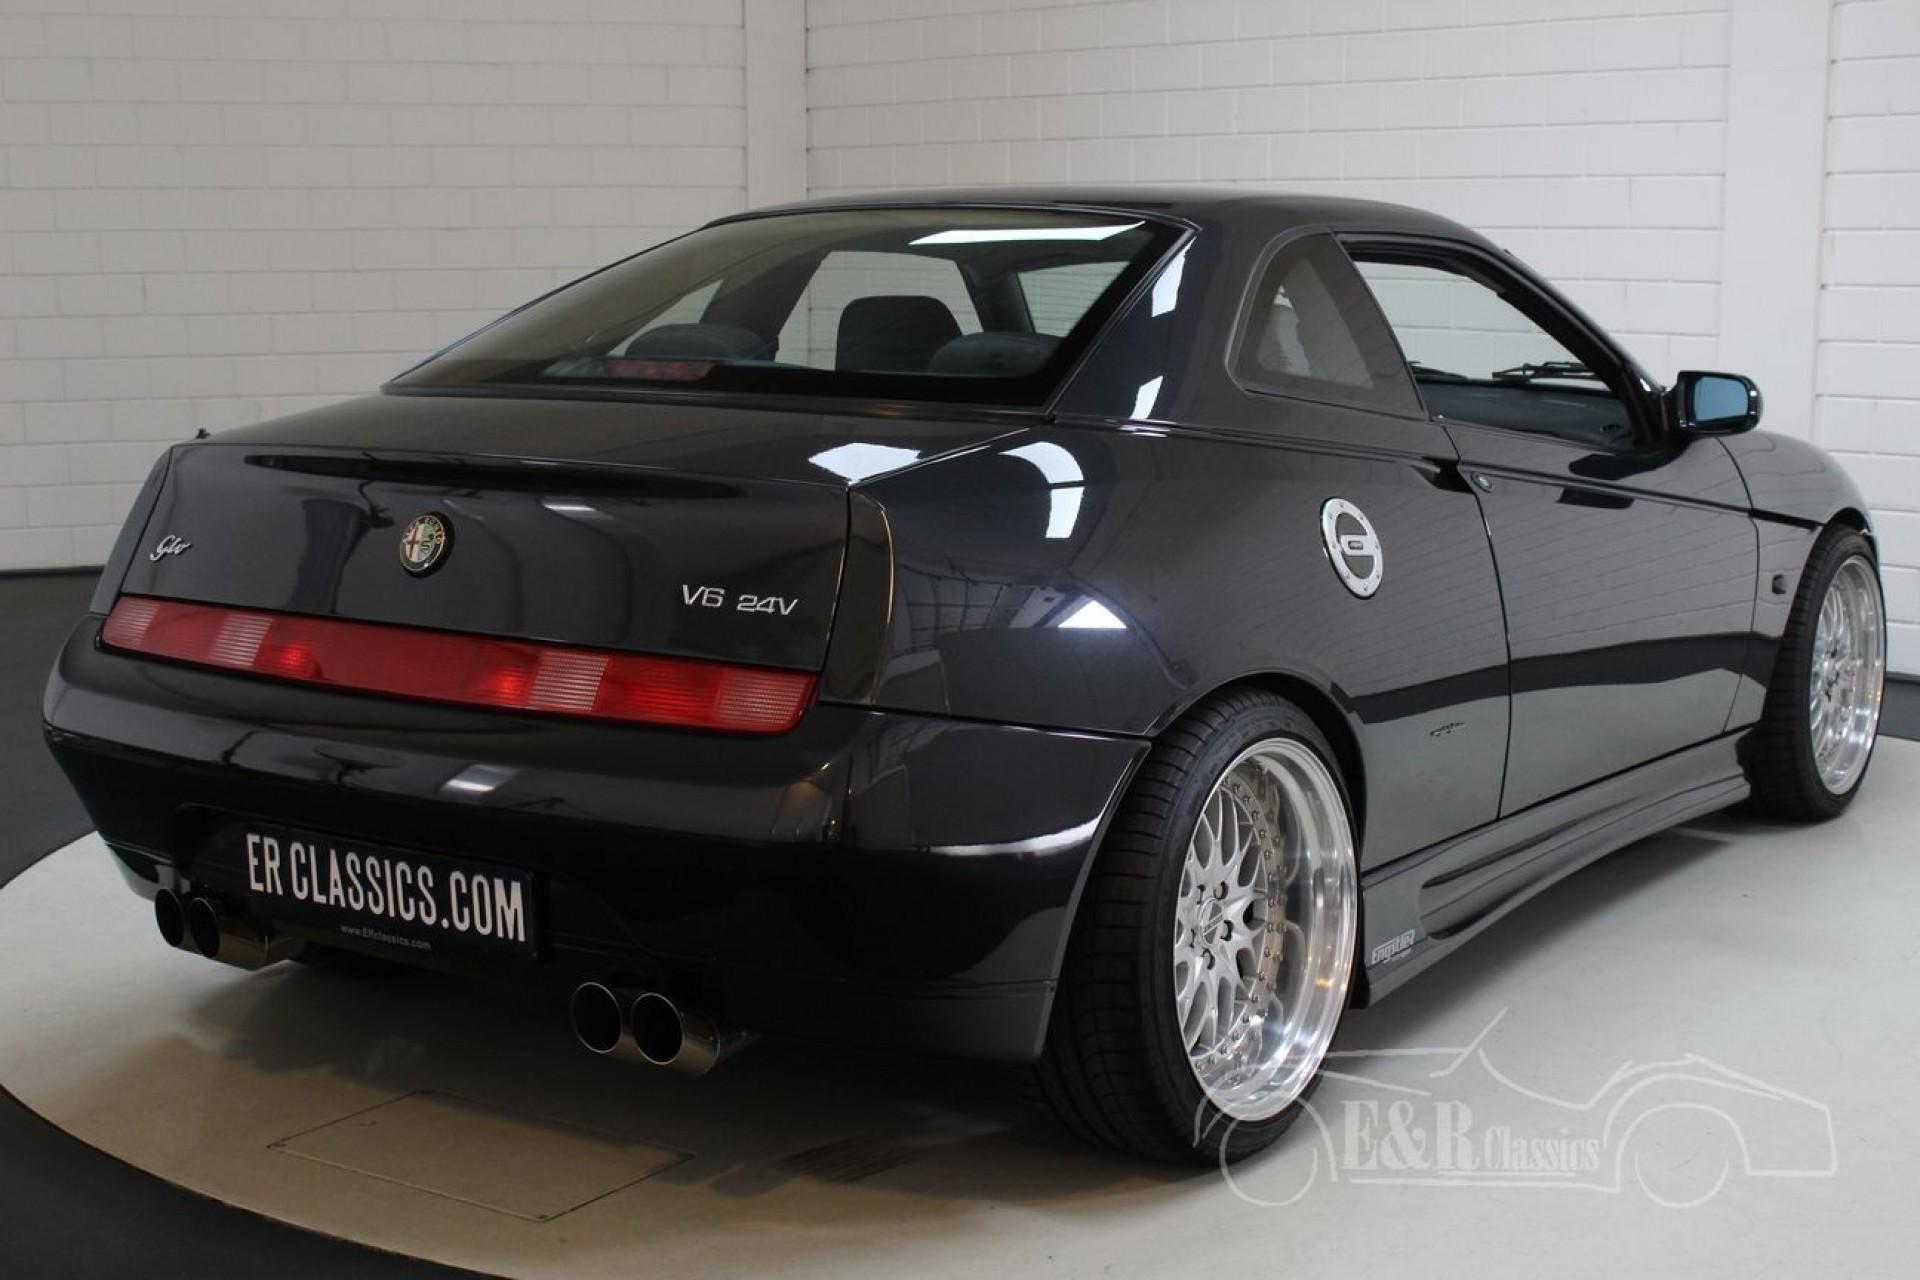 Alfa Romeo Gtv 30 V6 Coupé 1997 Te Koop Bij Erclassics